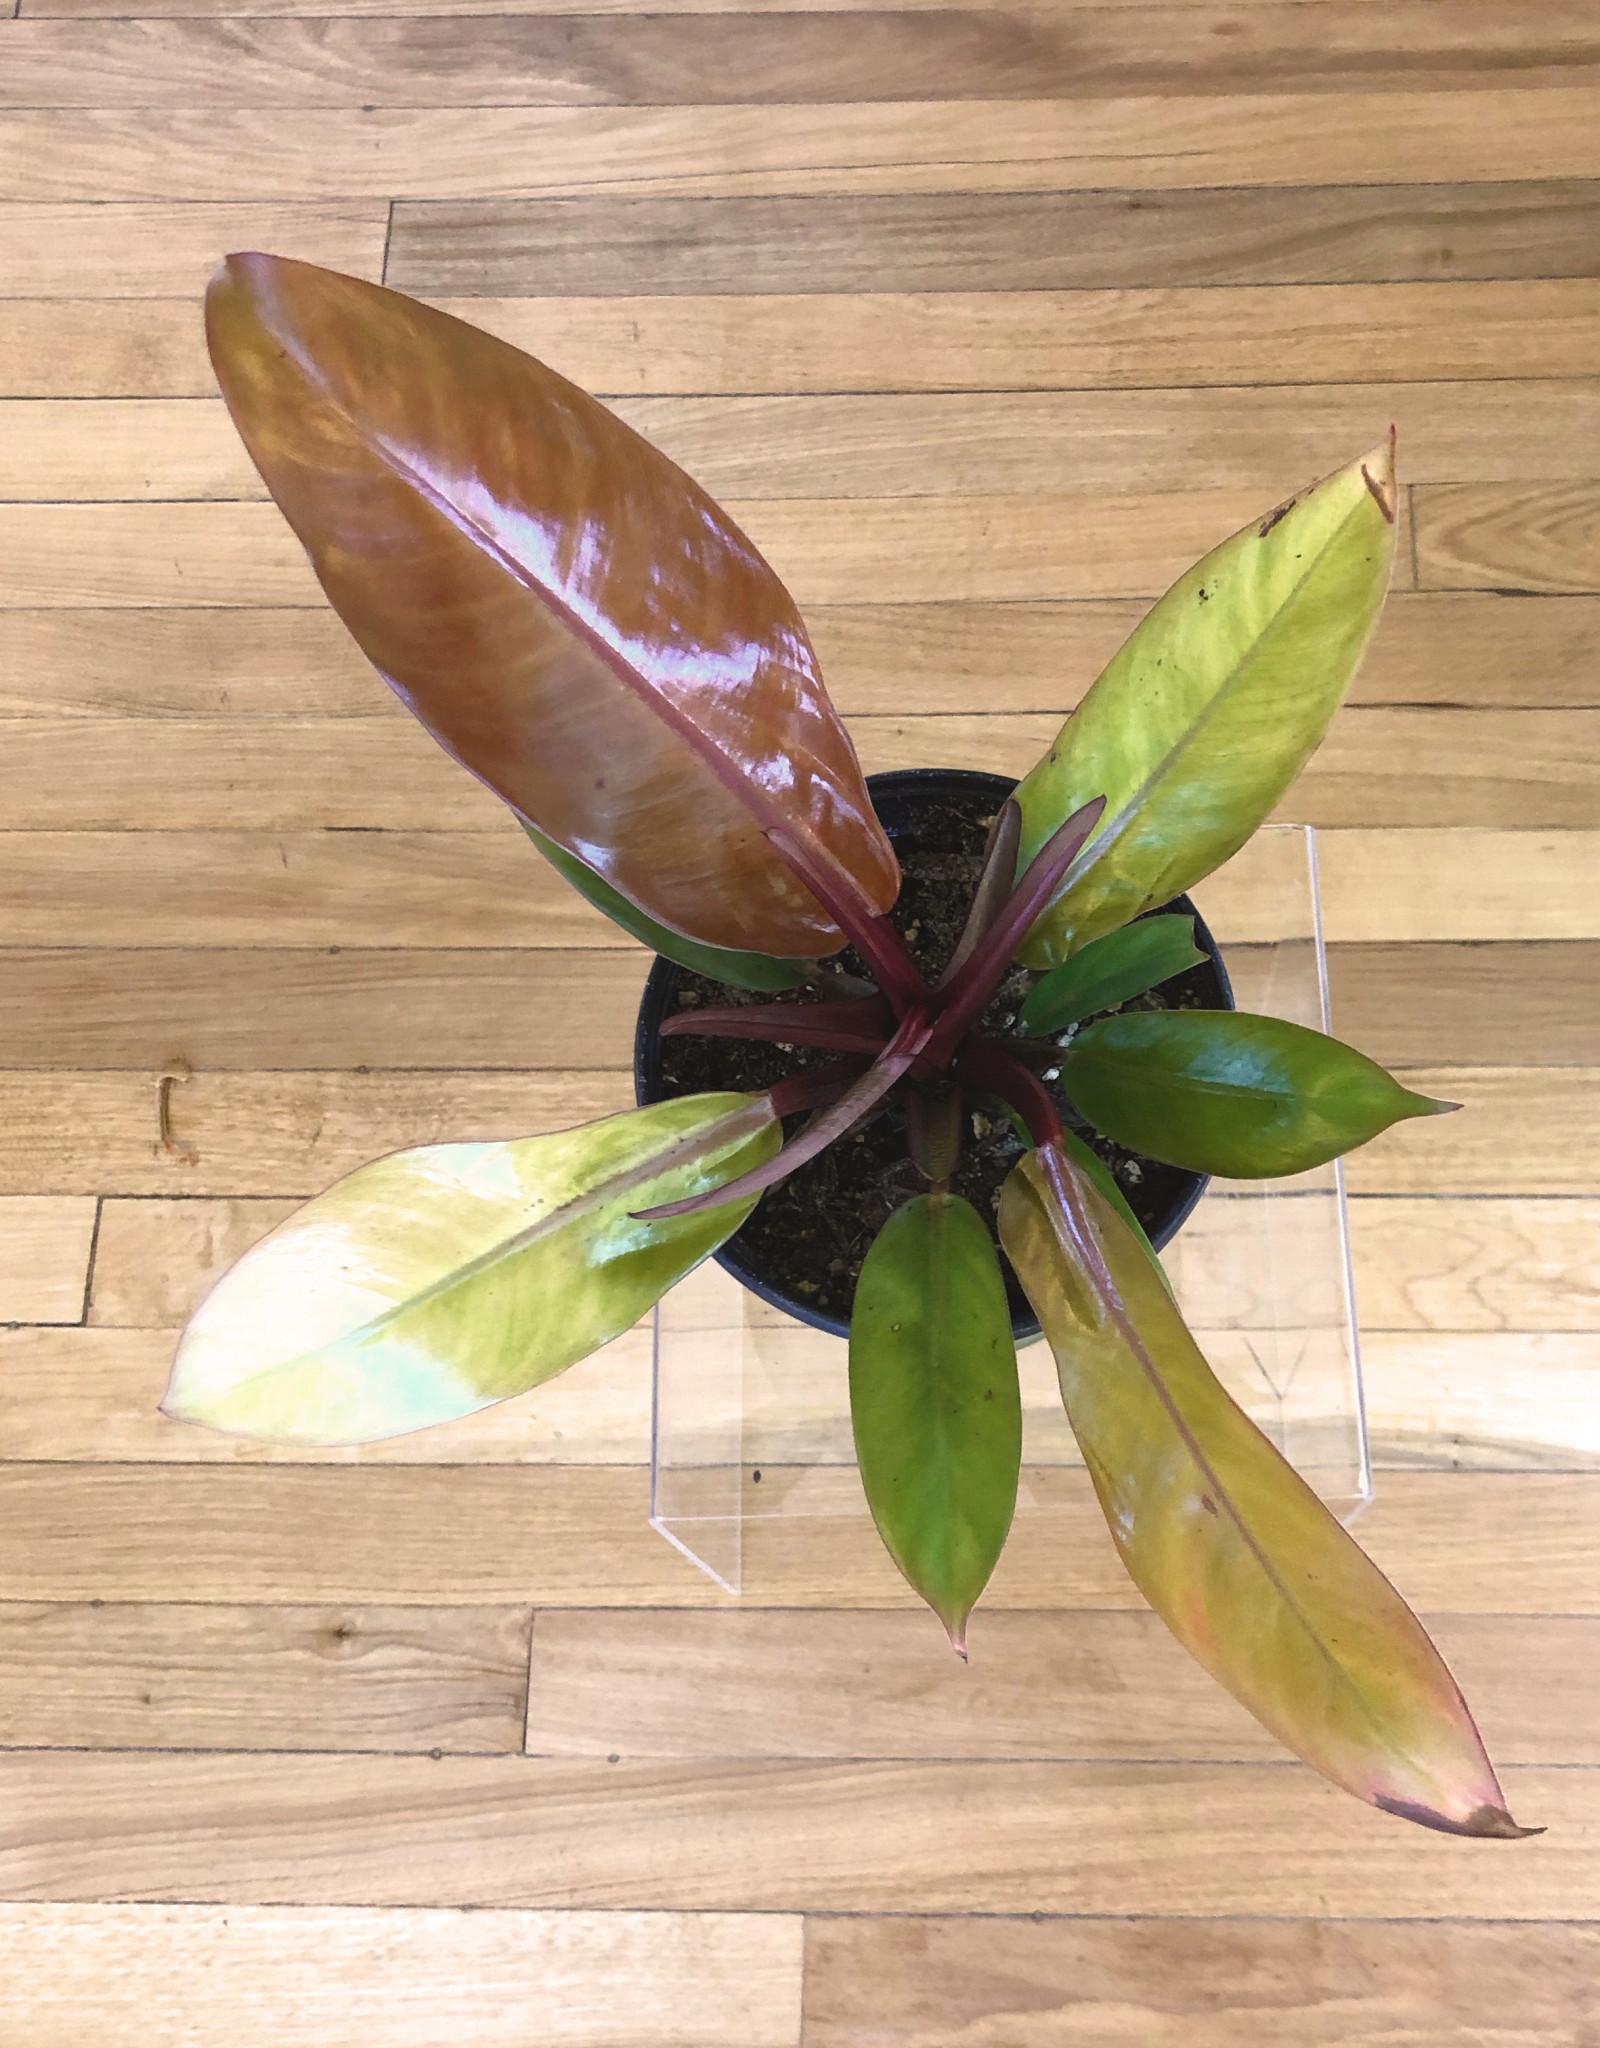 Curio Philodendron 'Prince of Orange'